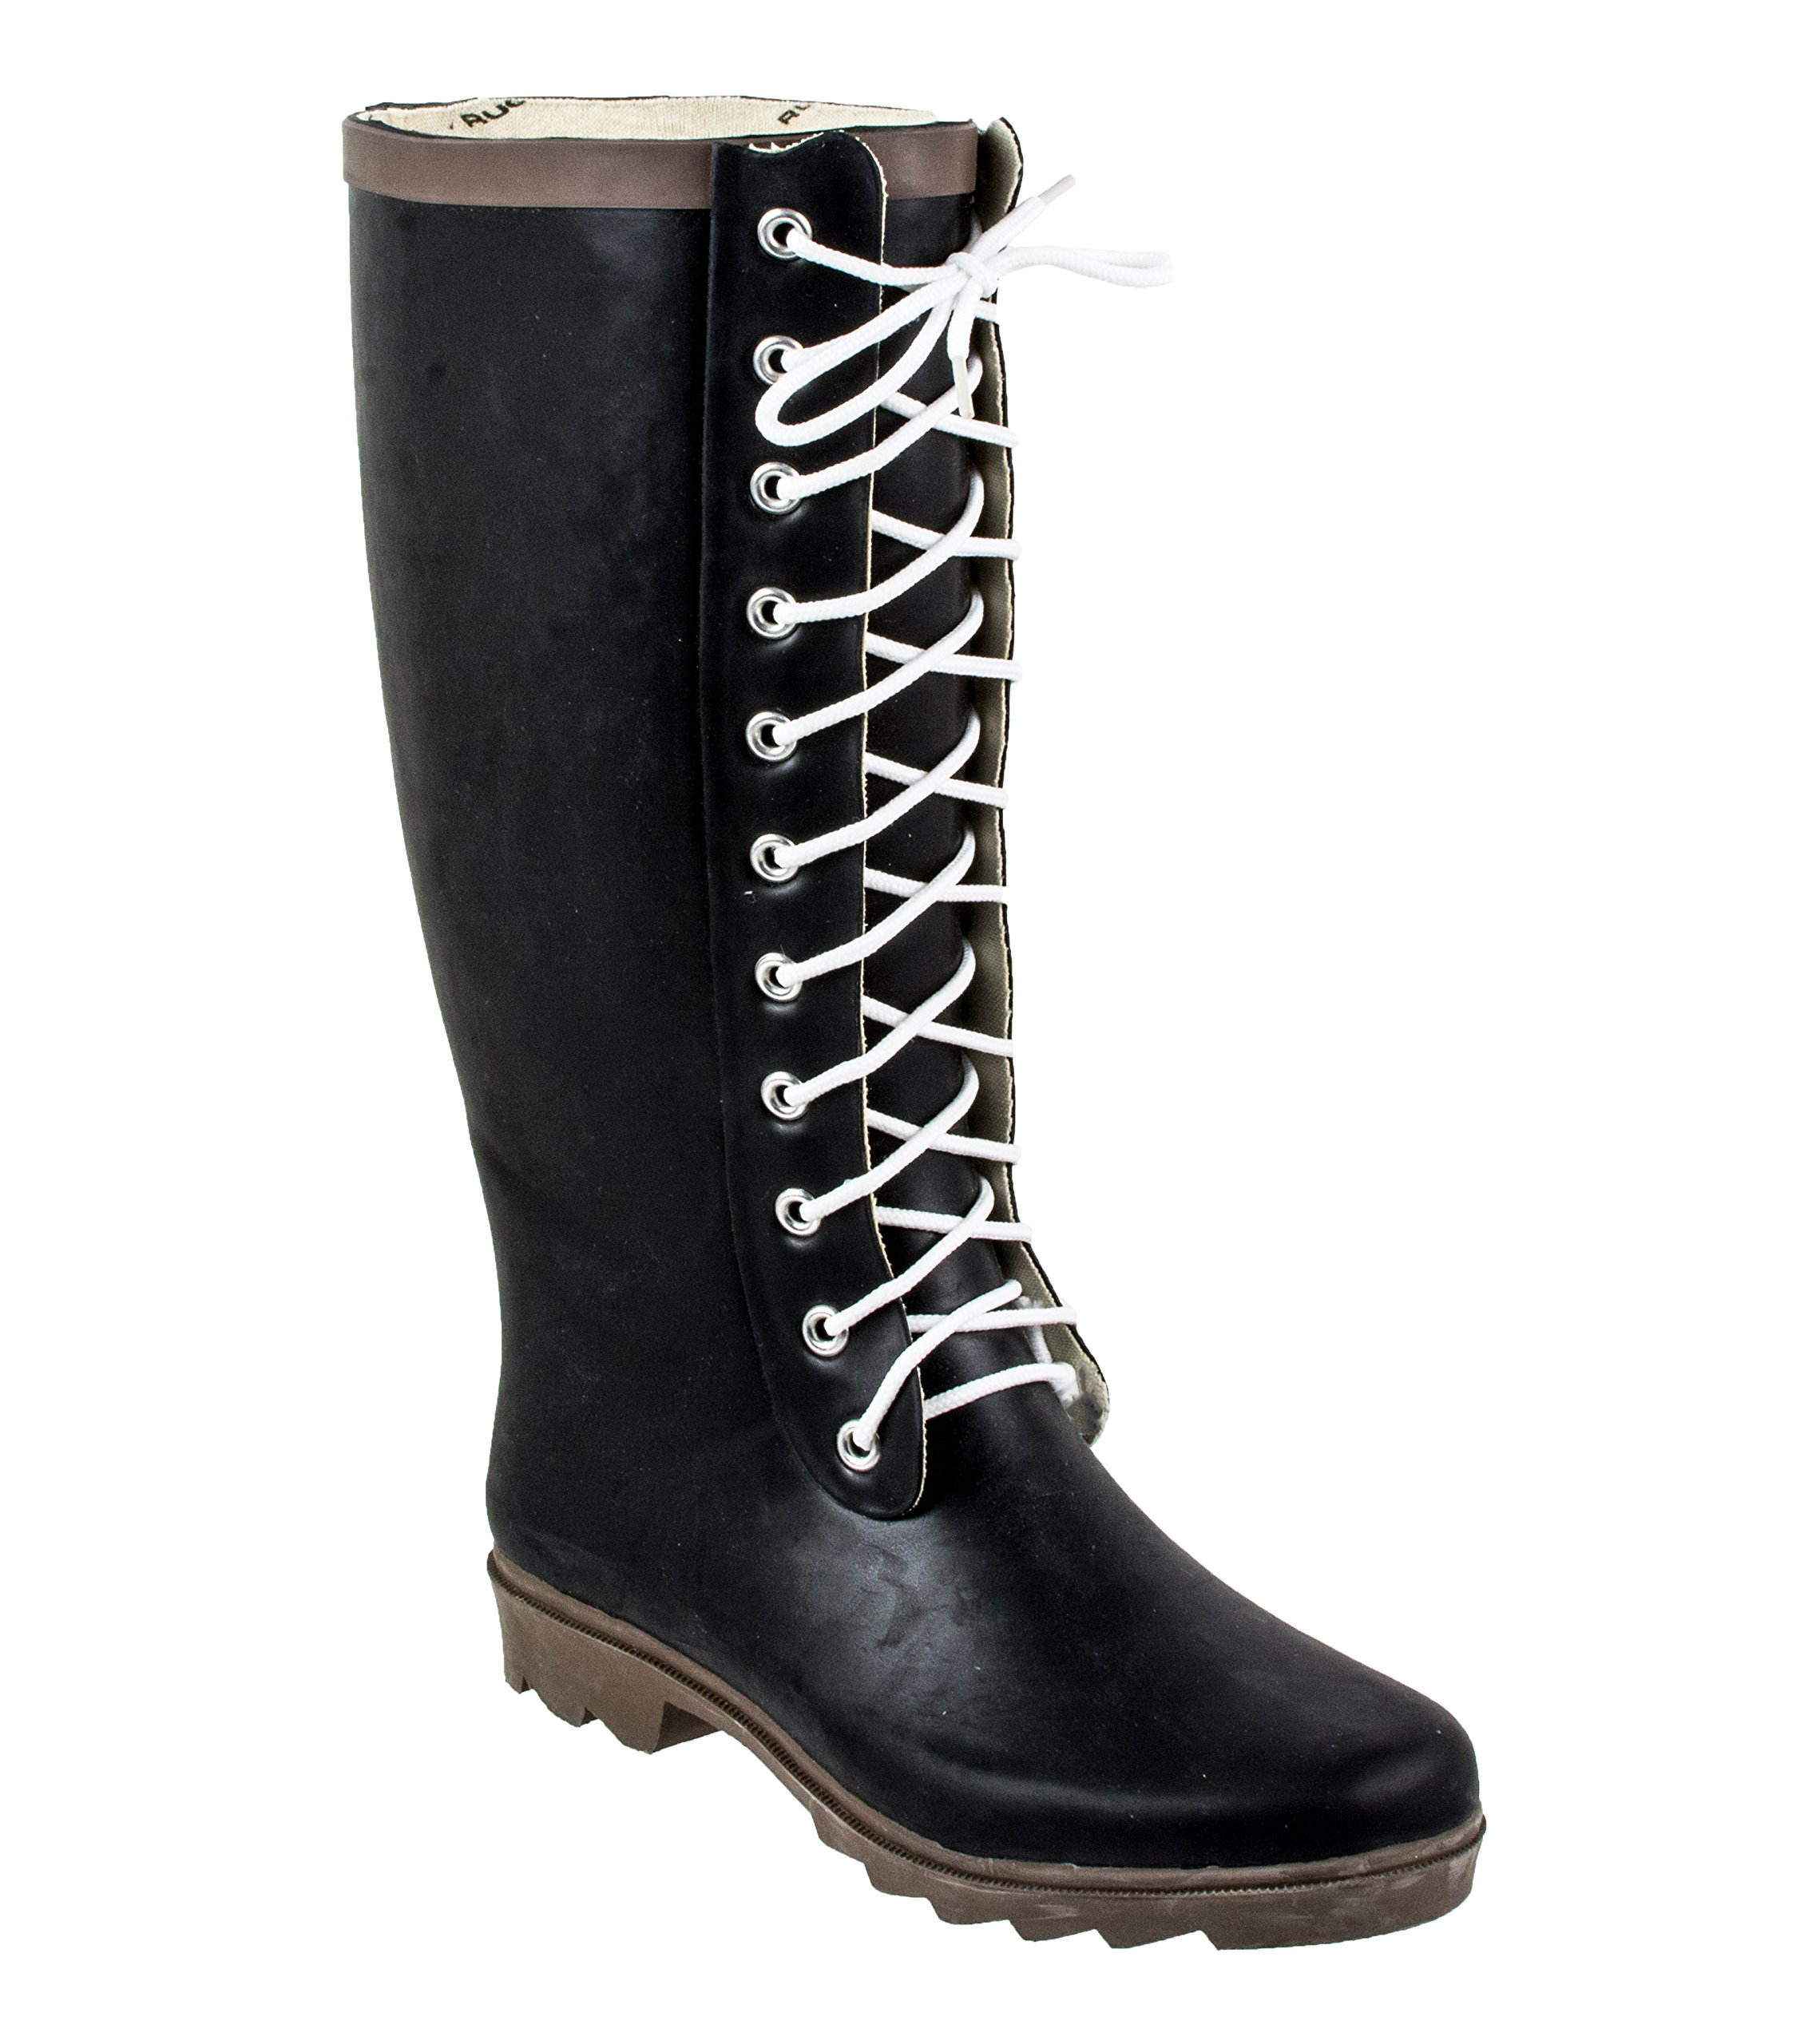 Rugged Shark Ladies Raindears Lace-up Rubber Rain Boots, Black, Size 7